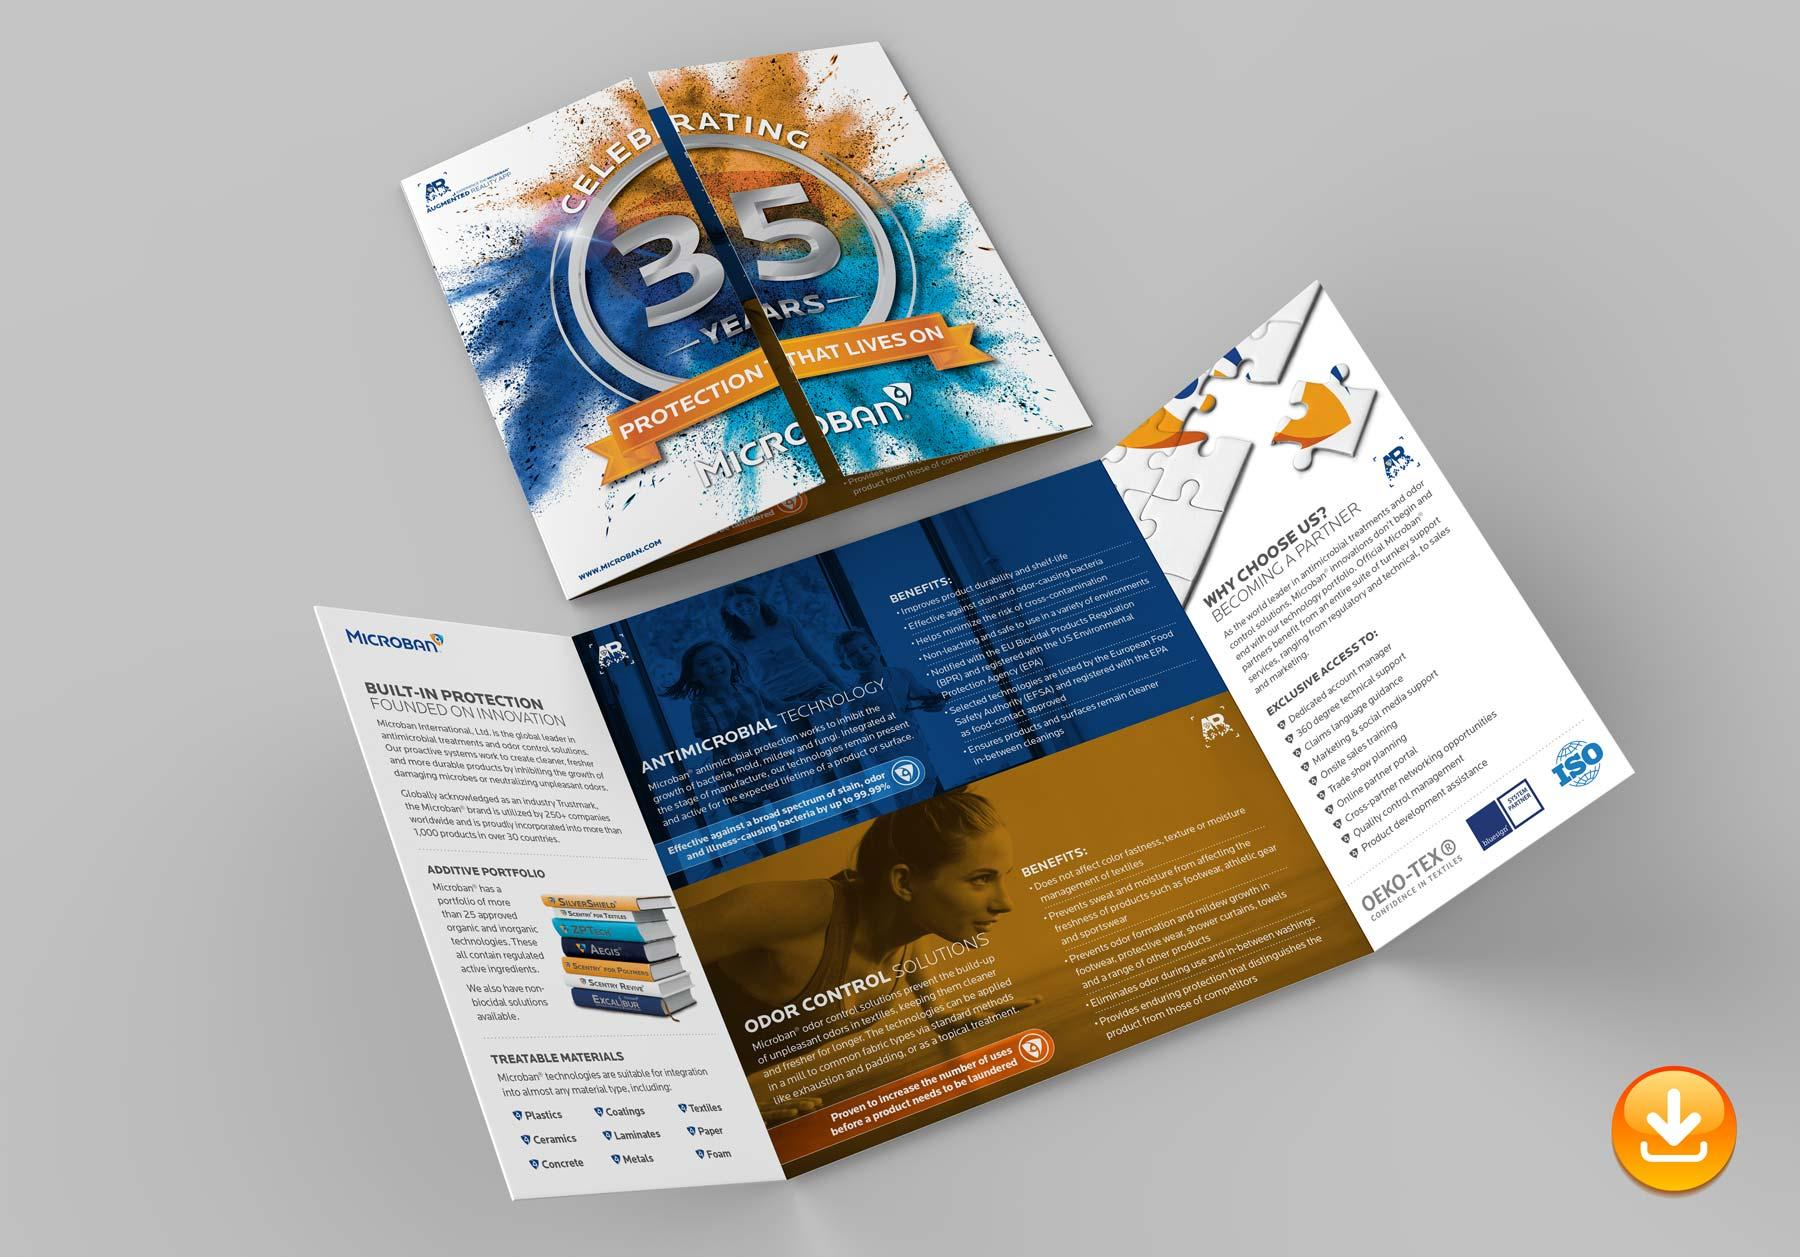 Microban Company Brochure 2019